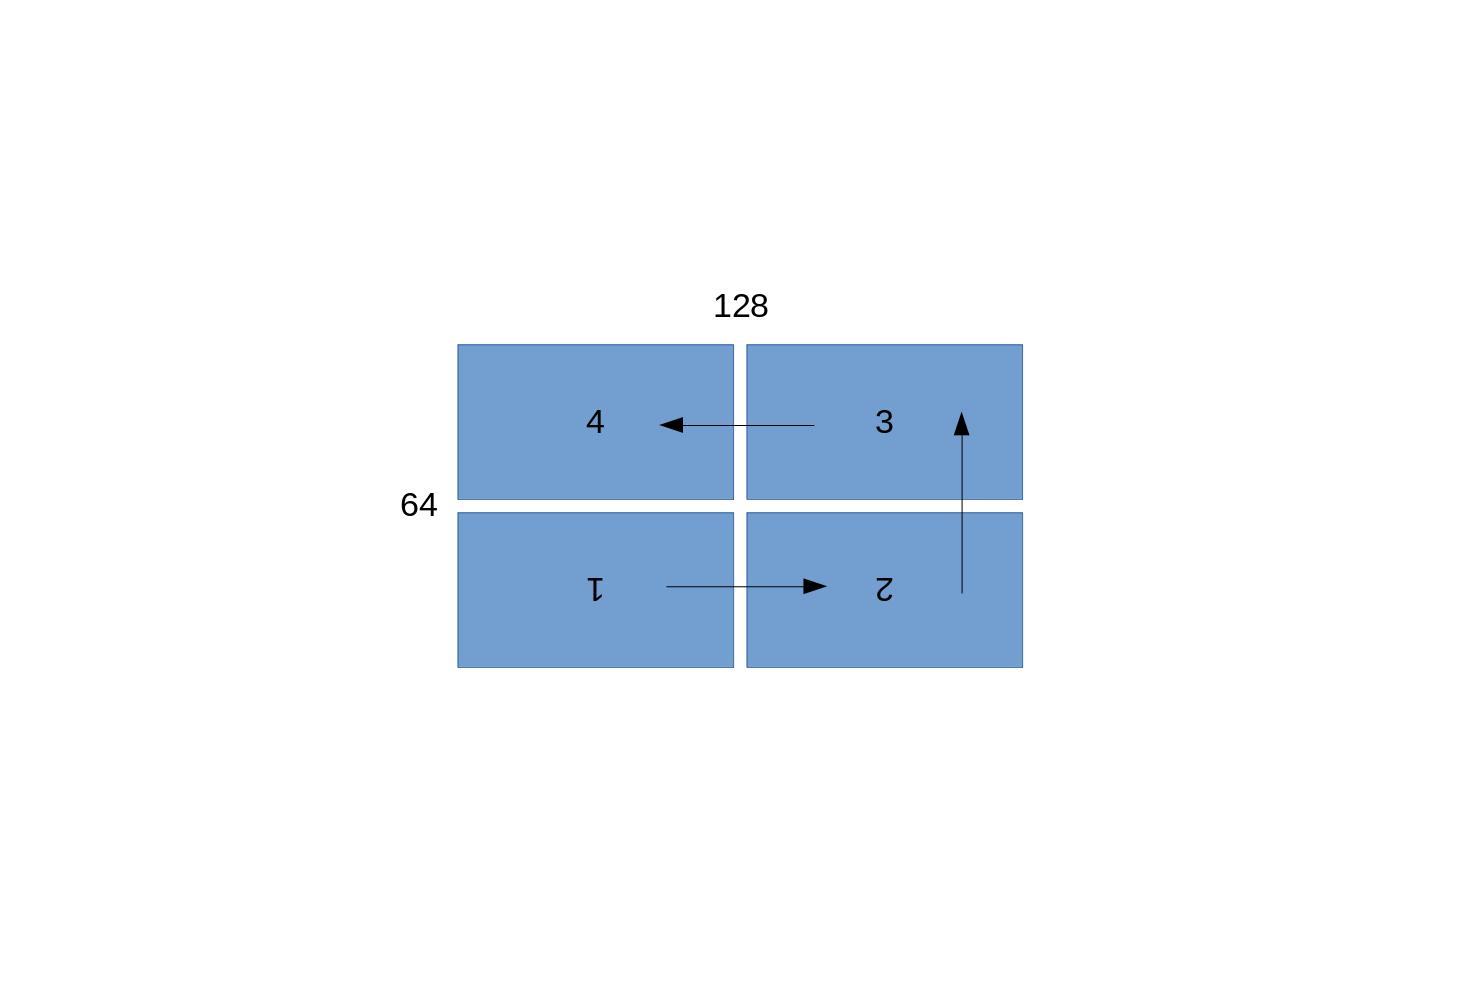 led_matrices_ksnip_20210128-113133.png